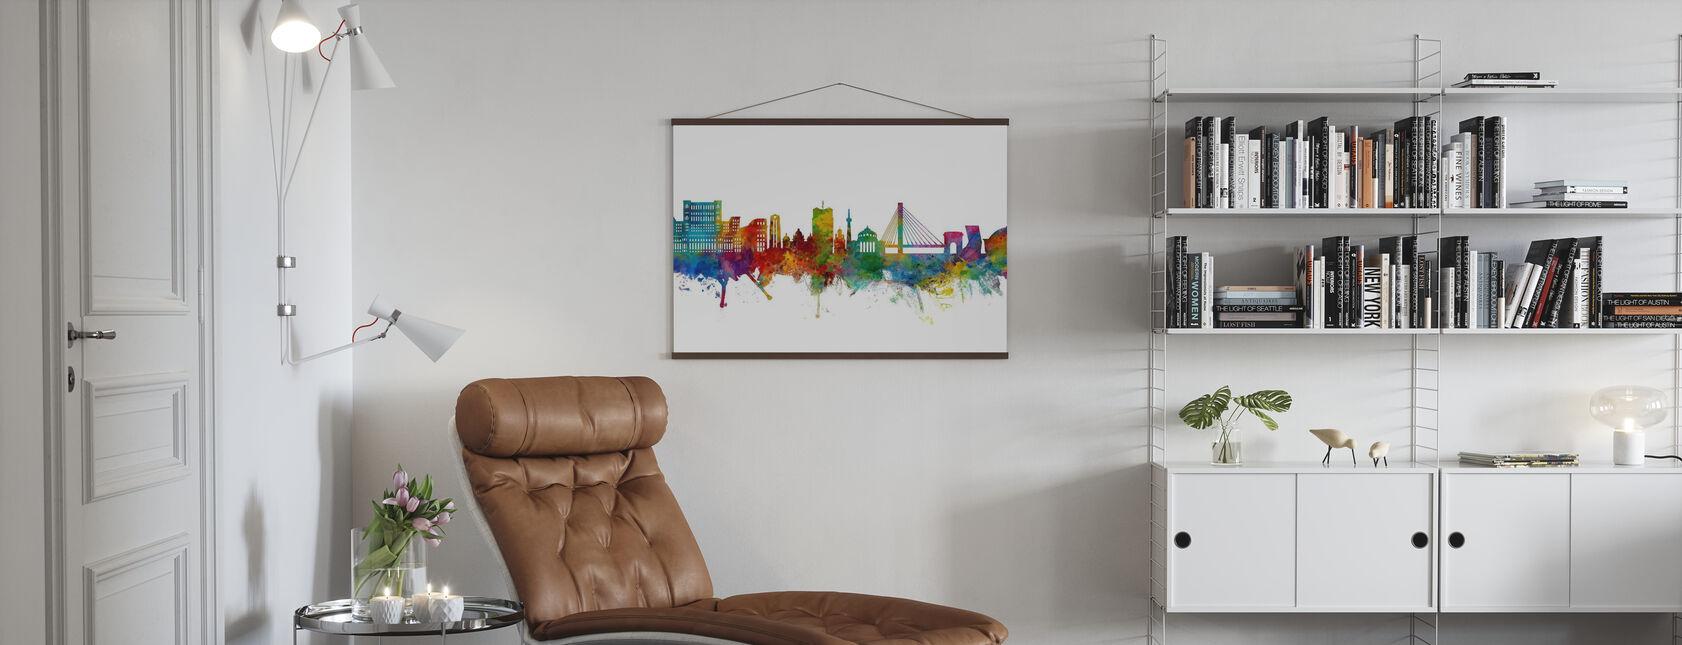 Bucharest Romania Skyline - Poster - Living Room